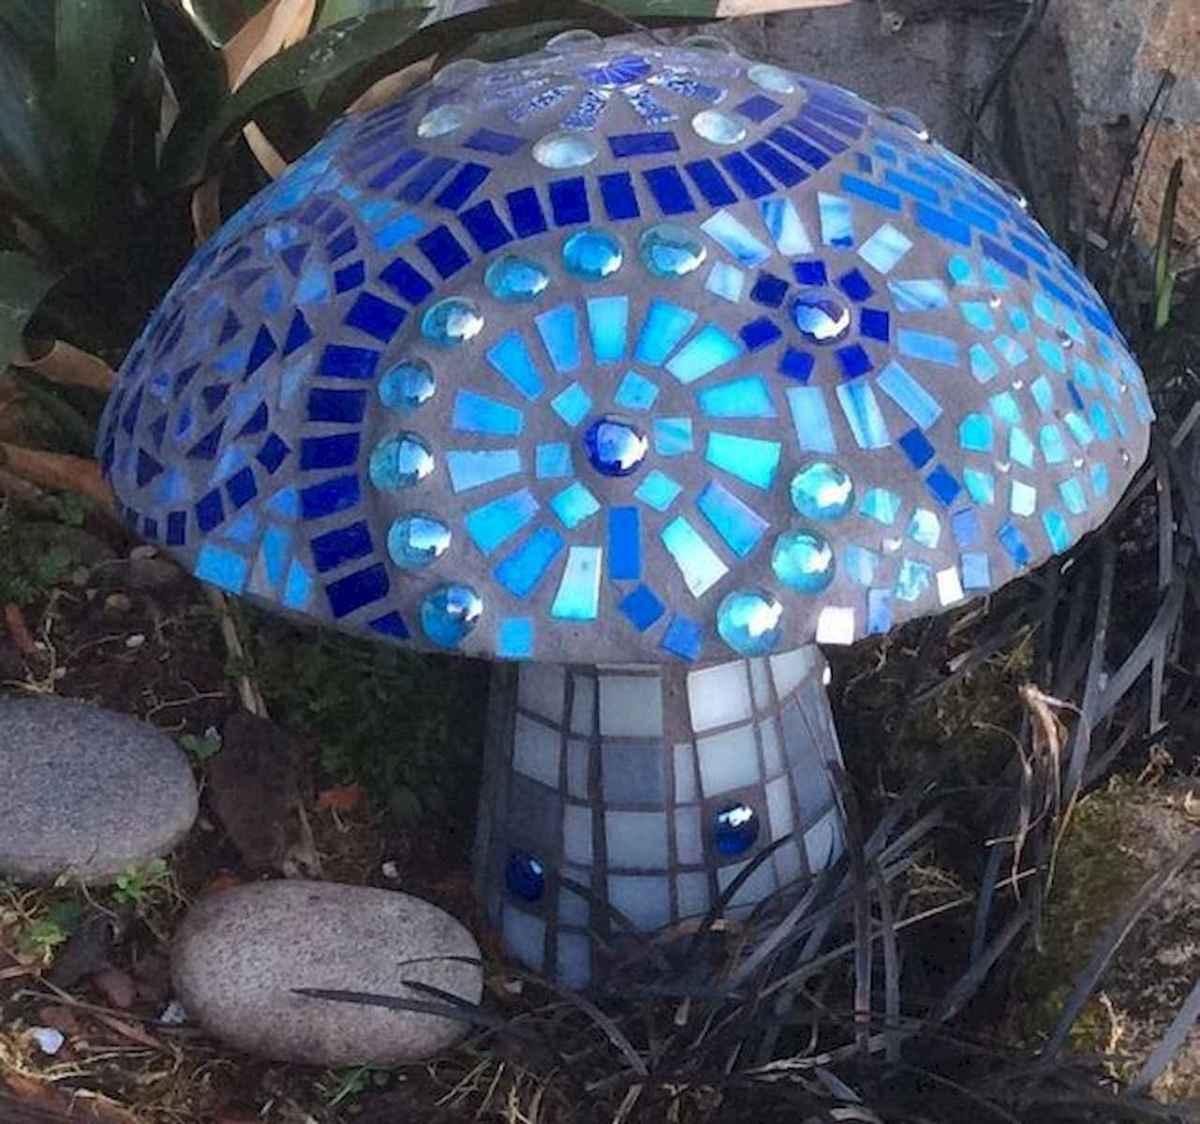 55 Creative Garden Art Mushrooms Design Ideas For Summer (44)